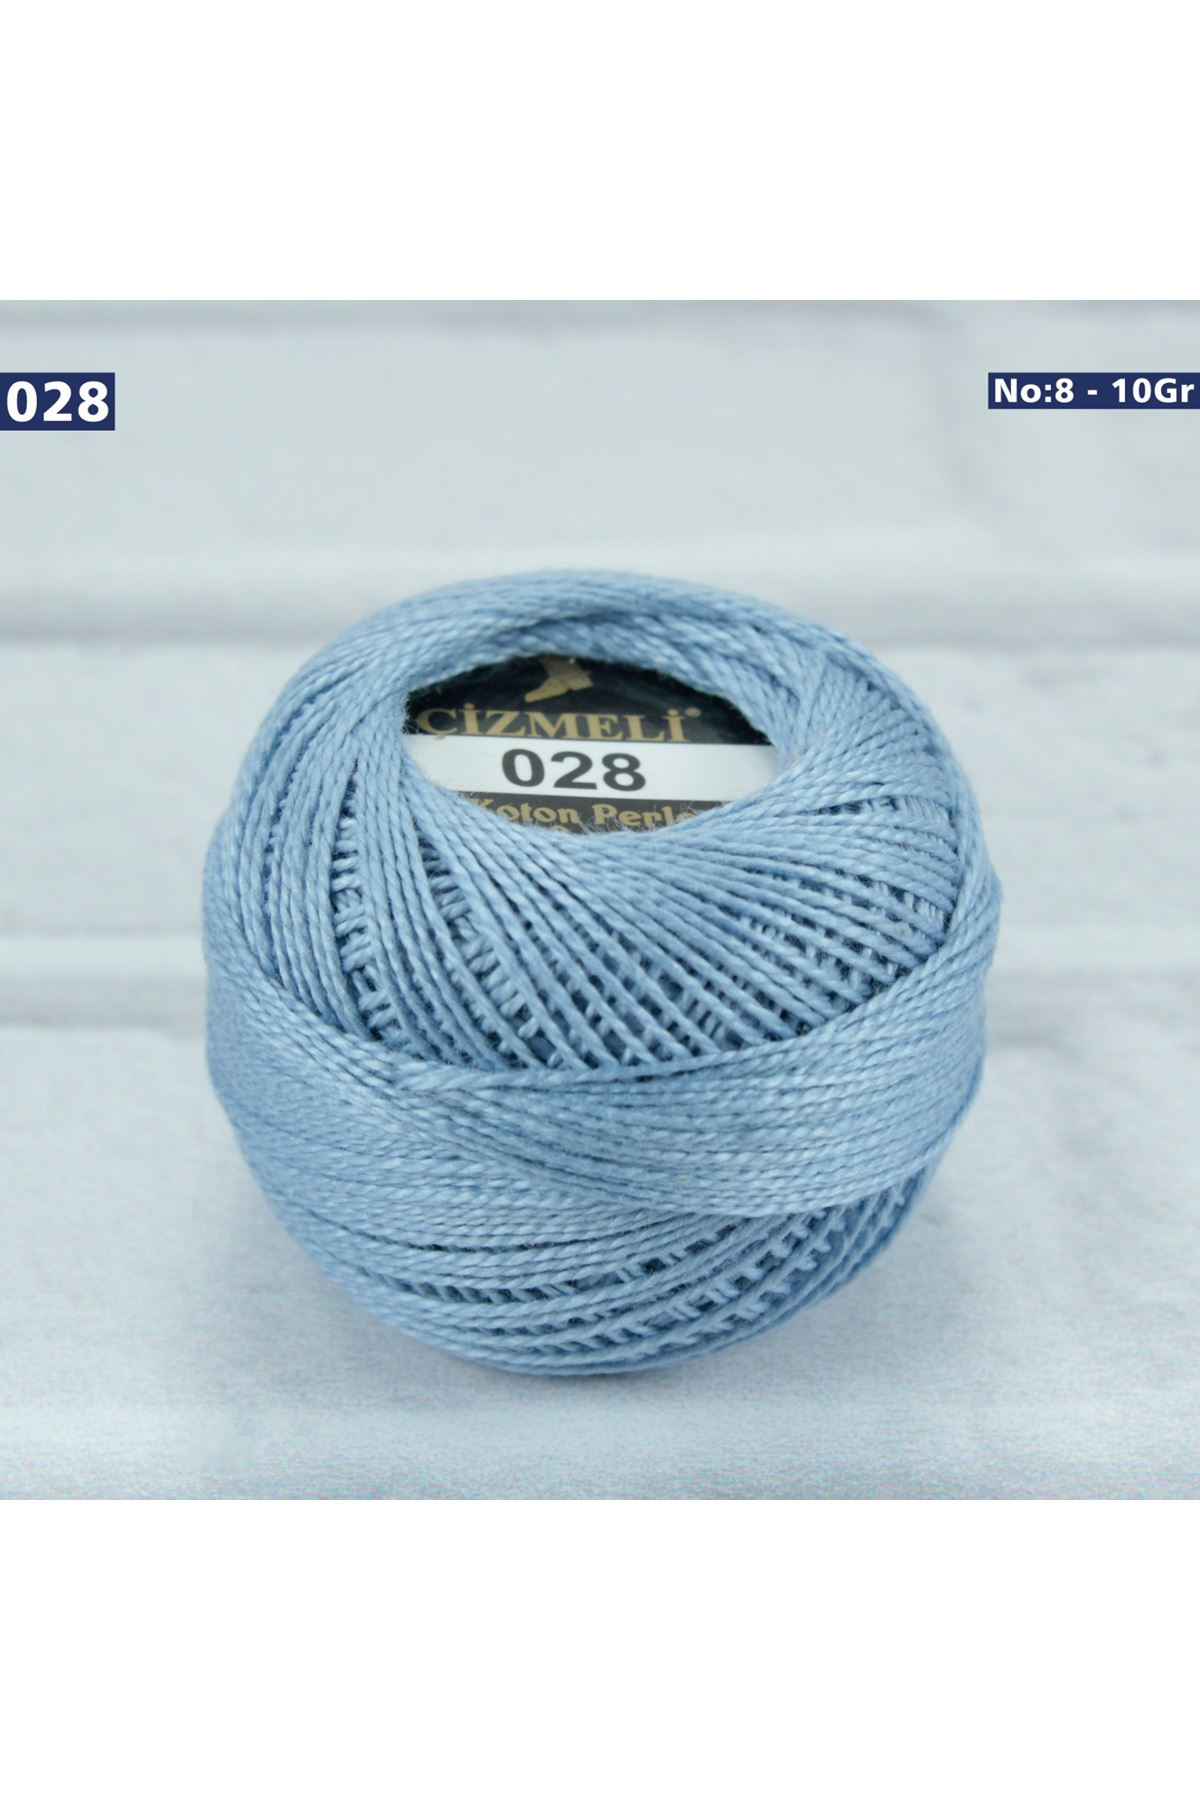 Çizmeli Cotton Perle Nakış İpliği No: 028